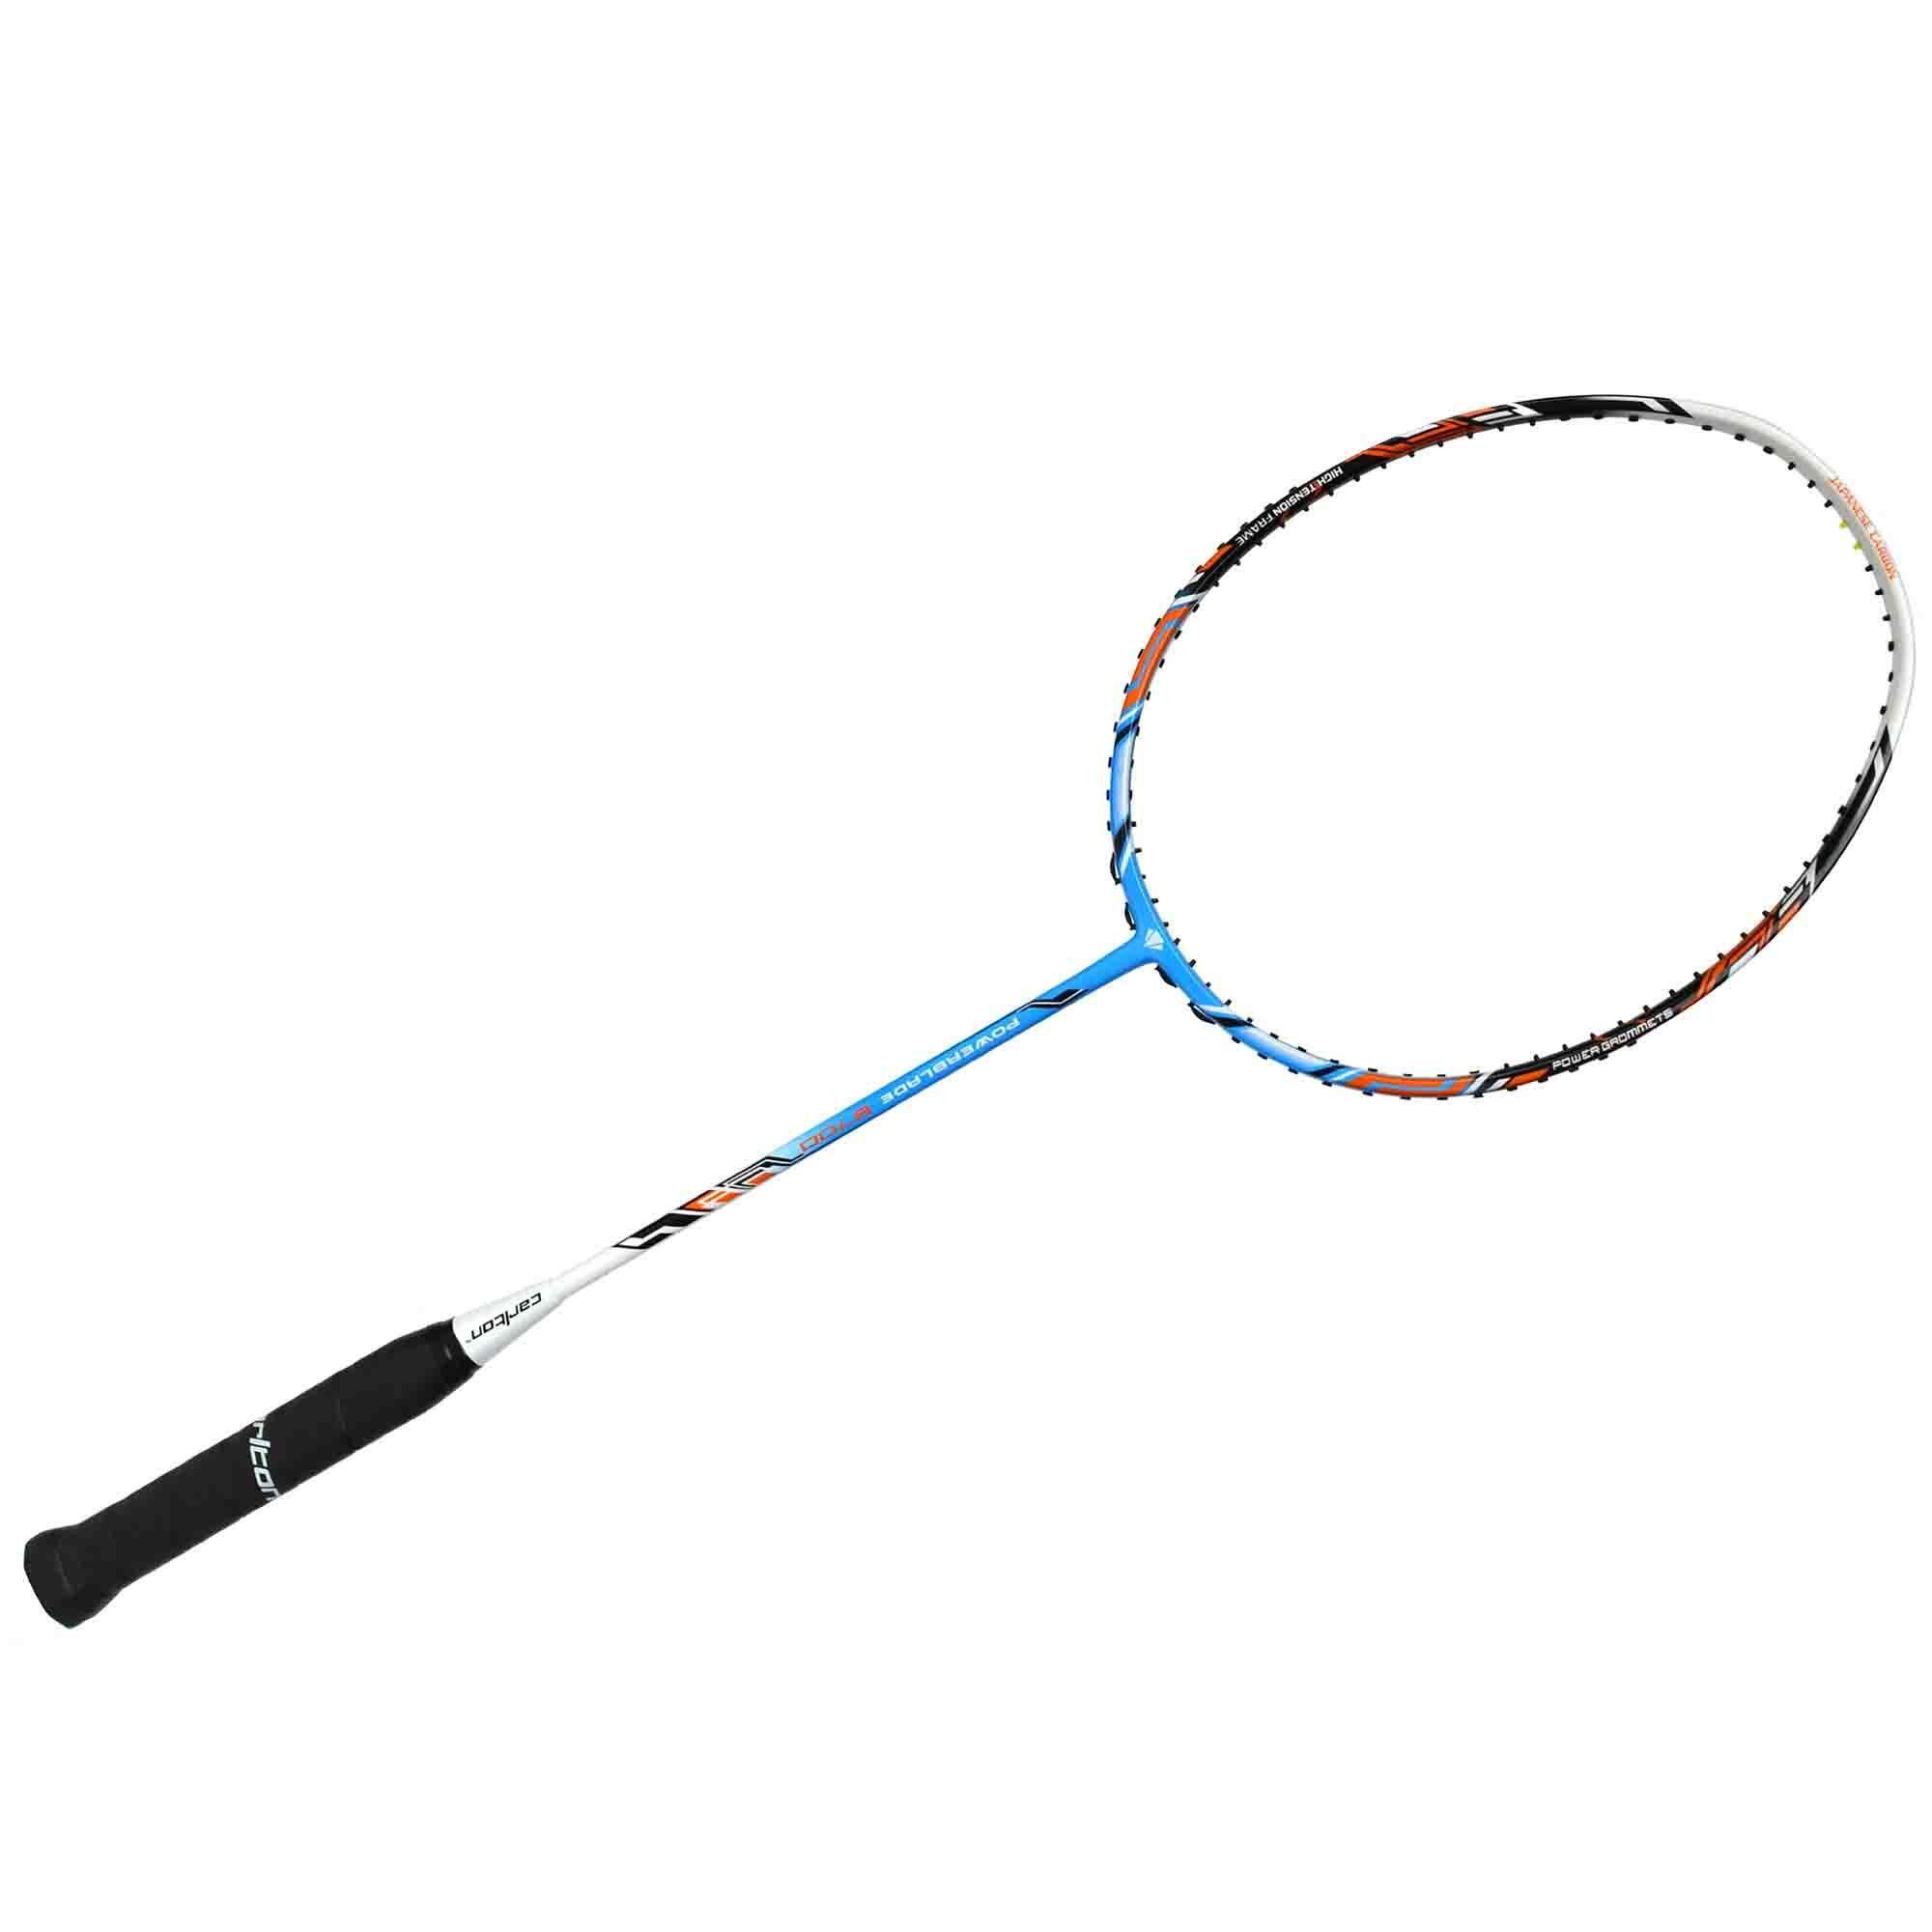 Carlton PowerBlade 8700 Badminton Racket